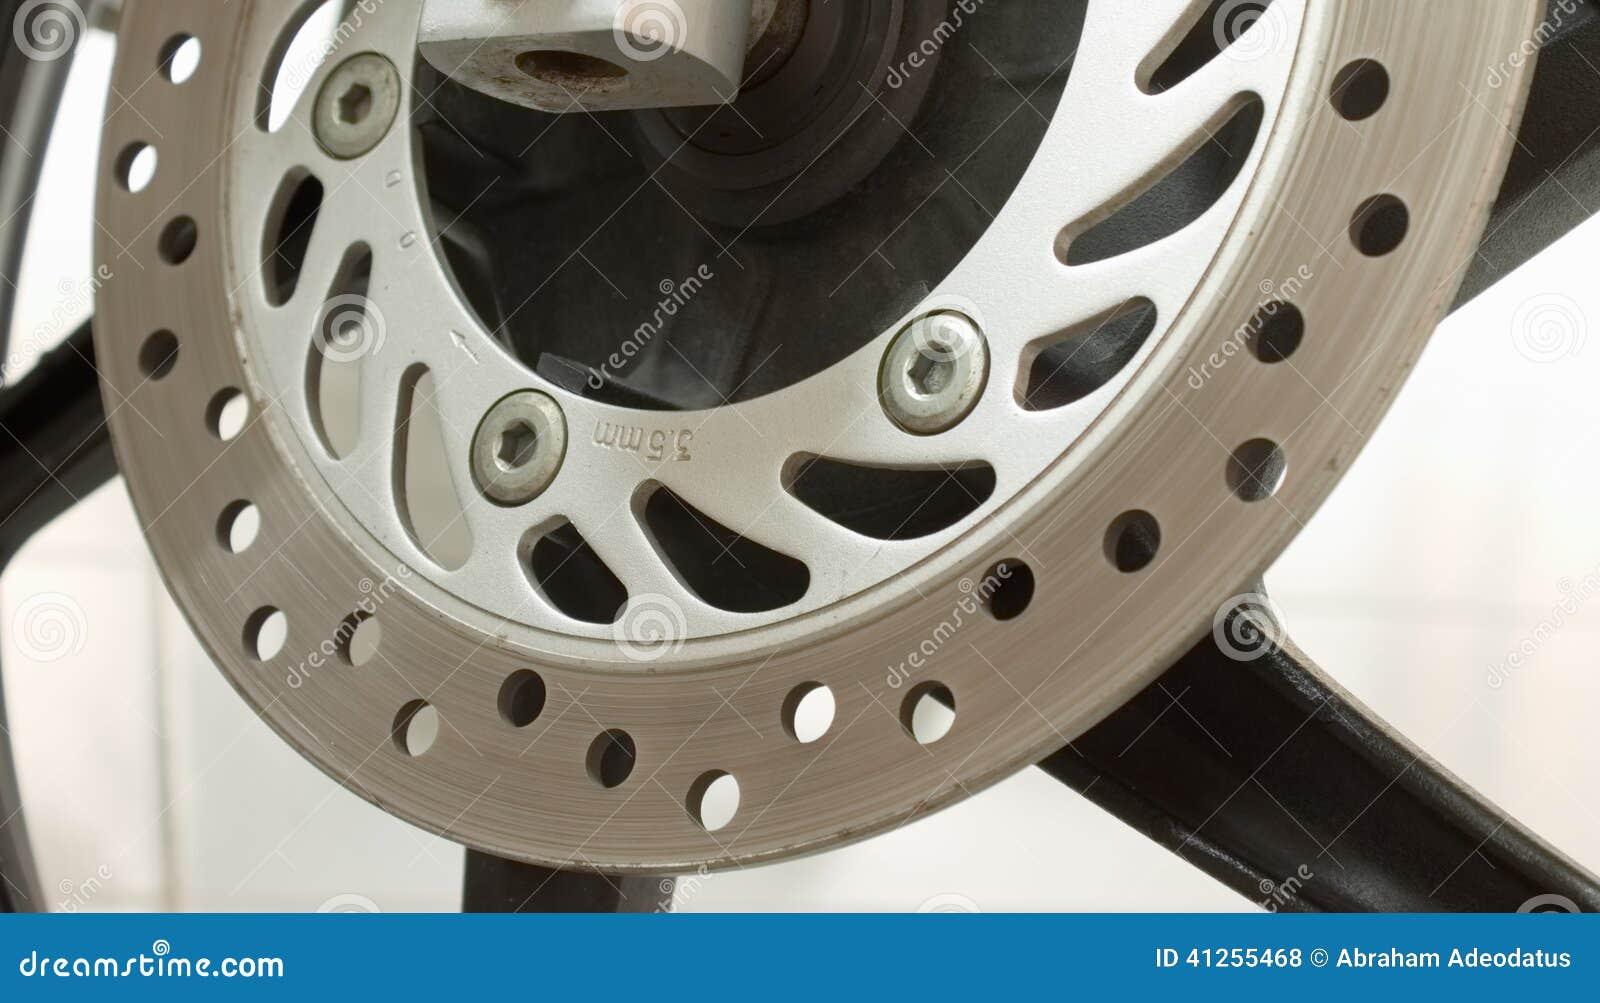 Ventilated disc brake stock photo  Image of motorbike - 41255468